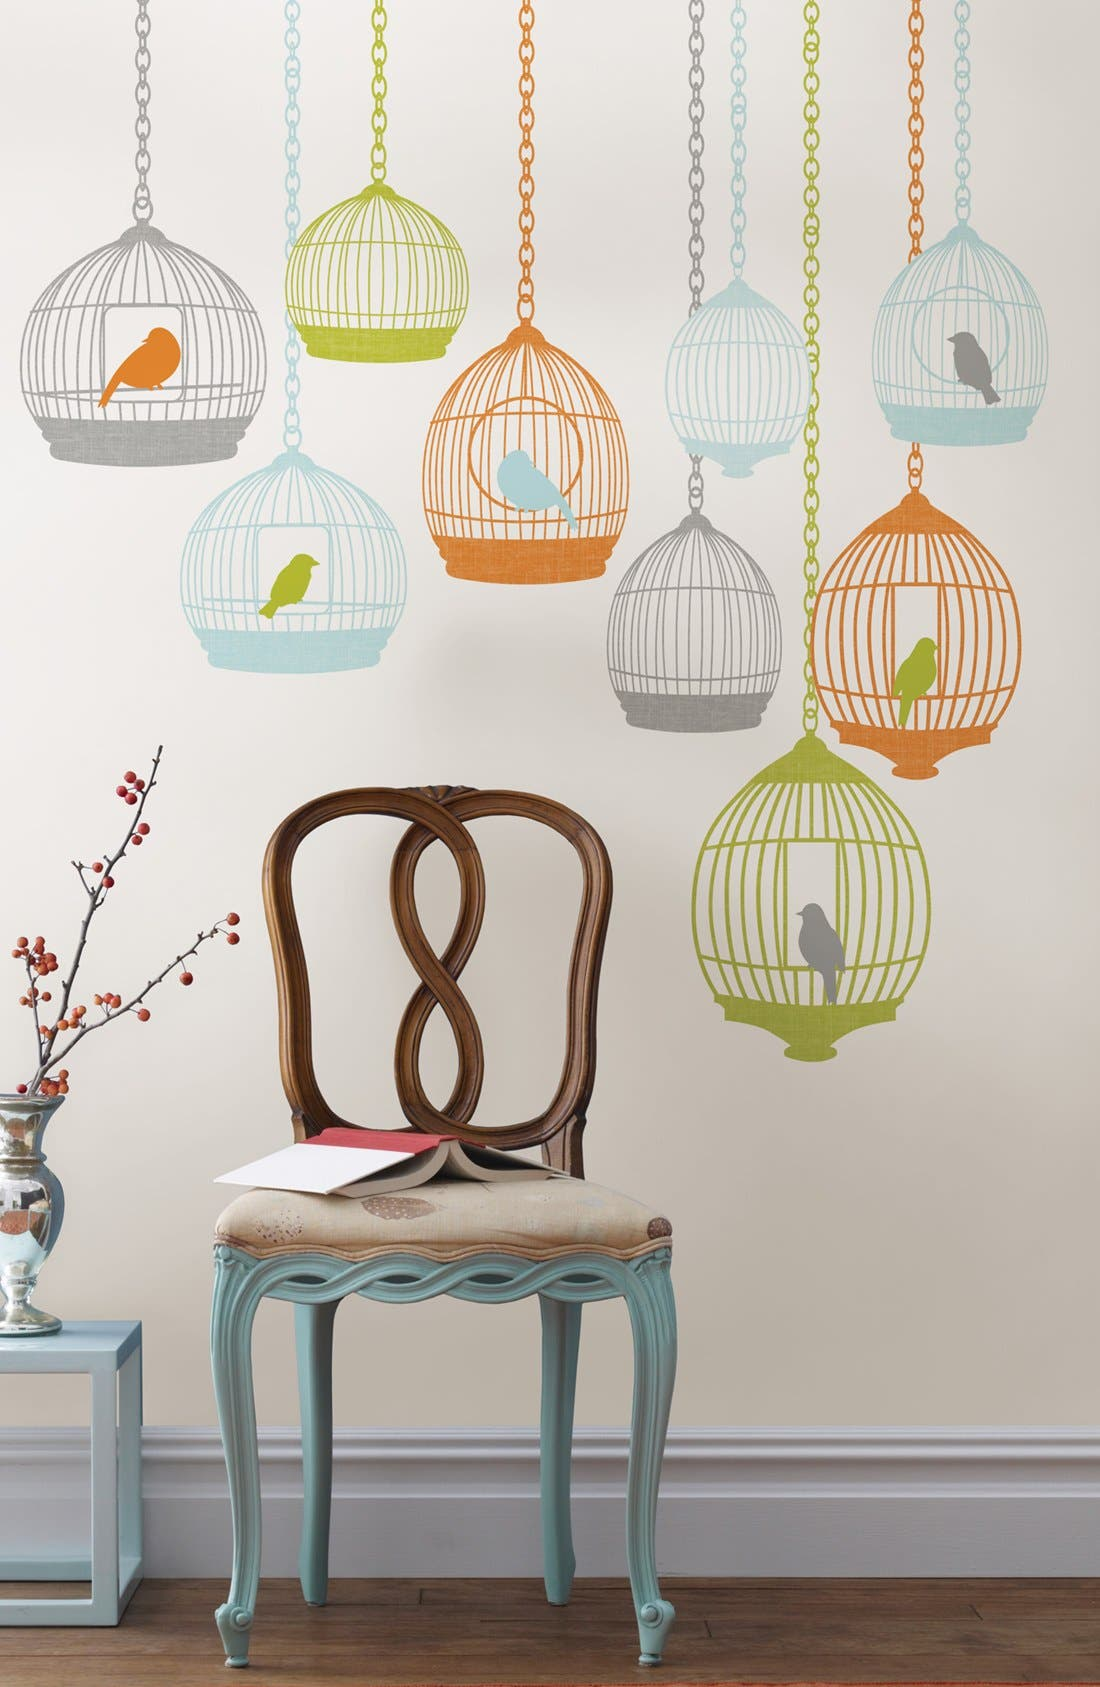 Main Image - Wallpops Birdcage Wall Art